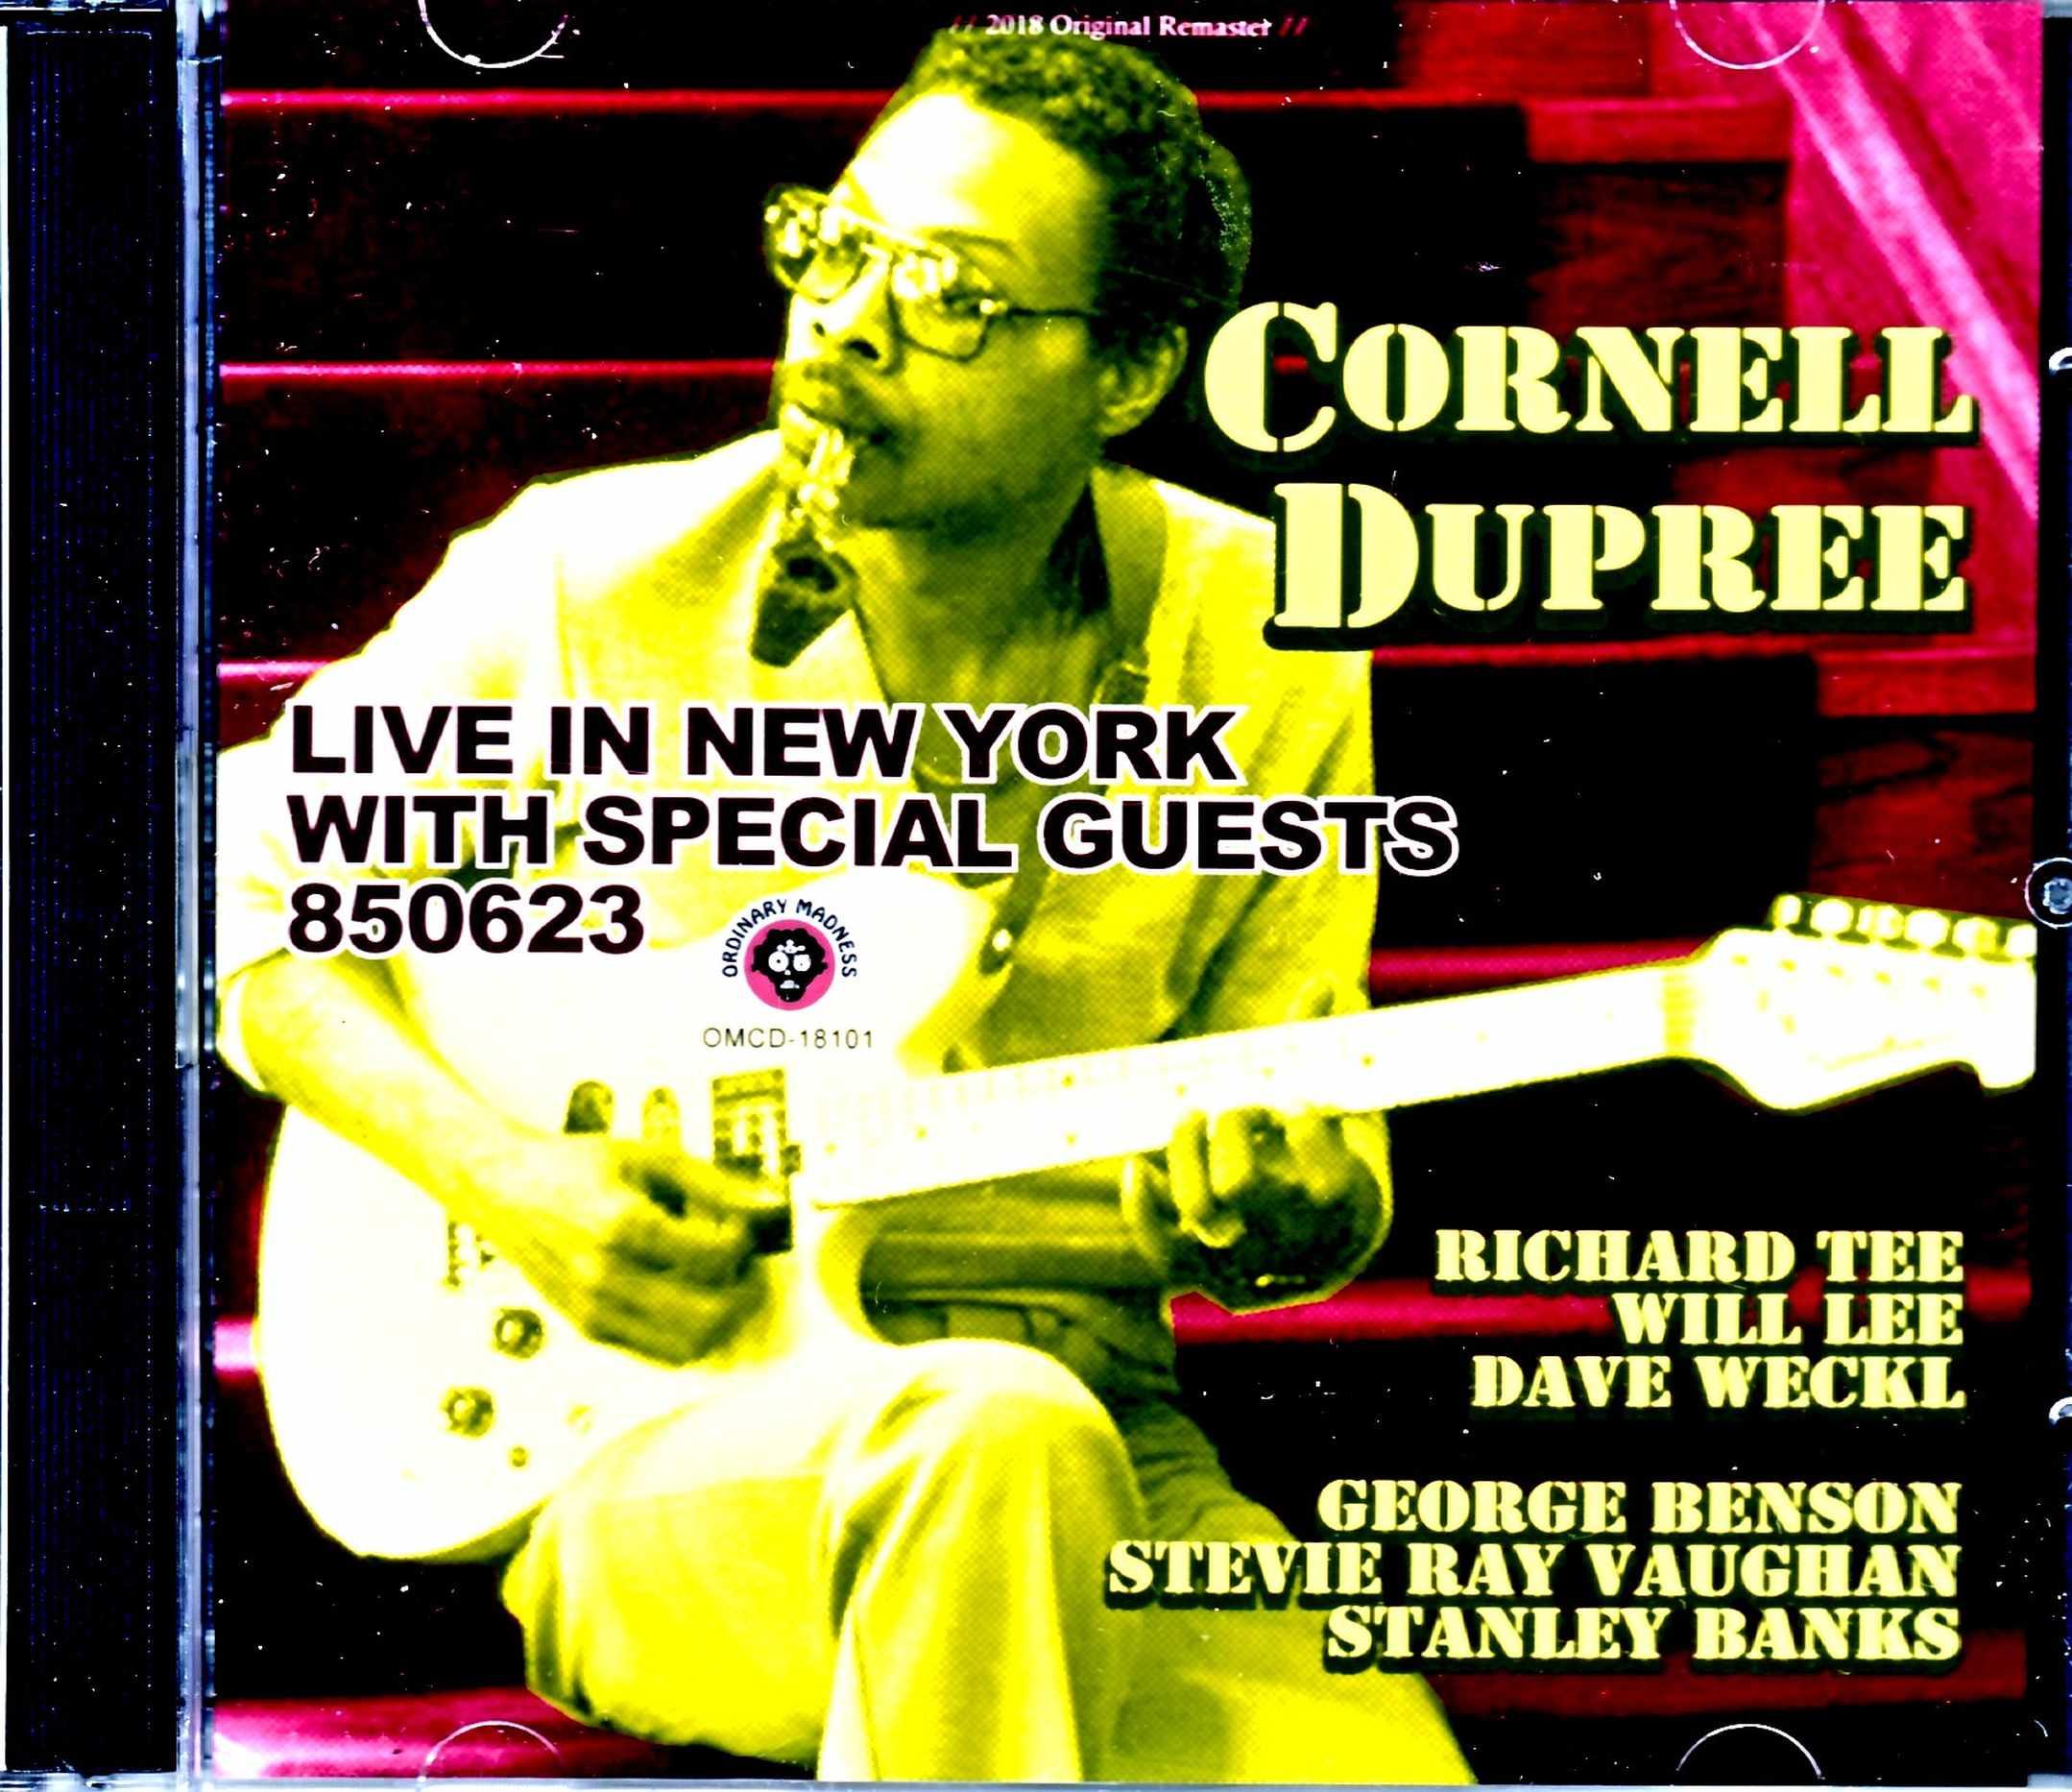 Cornell Dupree,Richard Tee コーネル・デュプリー リチャード・ティー/NY,USA 1985 Late Show